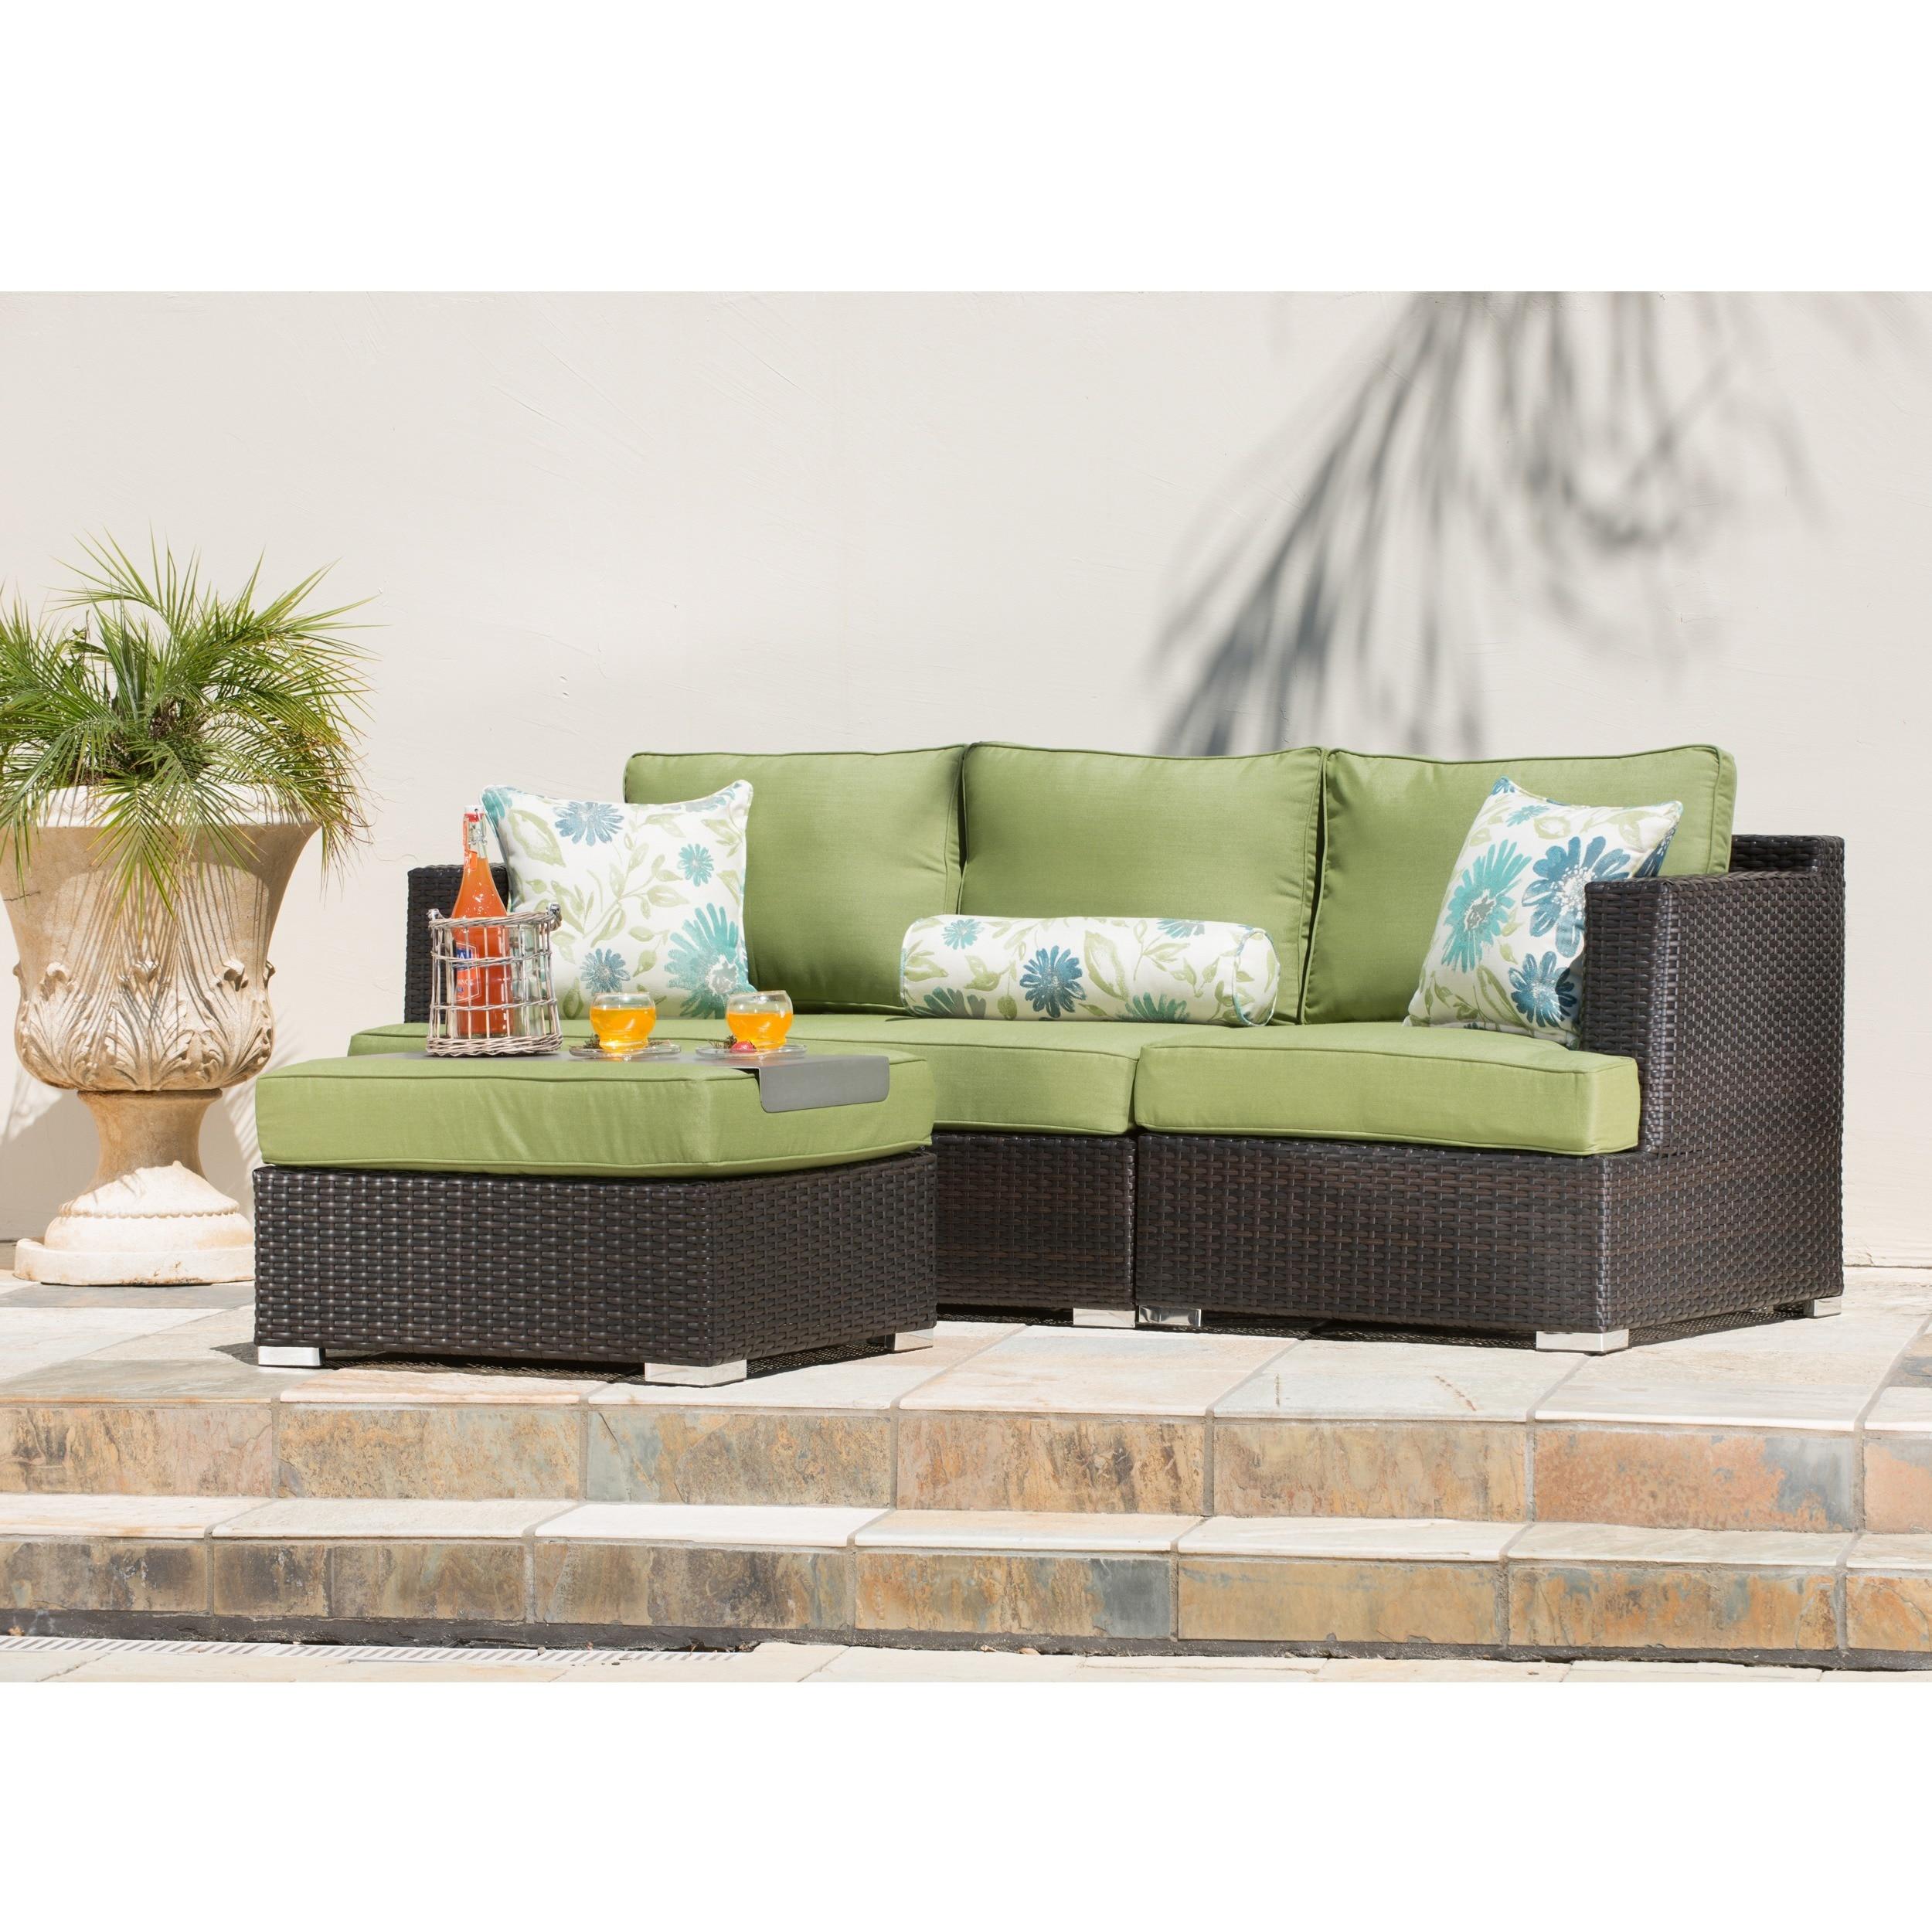 Corvus sorrento 4 piece brown wicker patio furniture set with sunbrella cushions